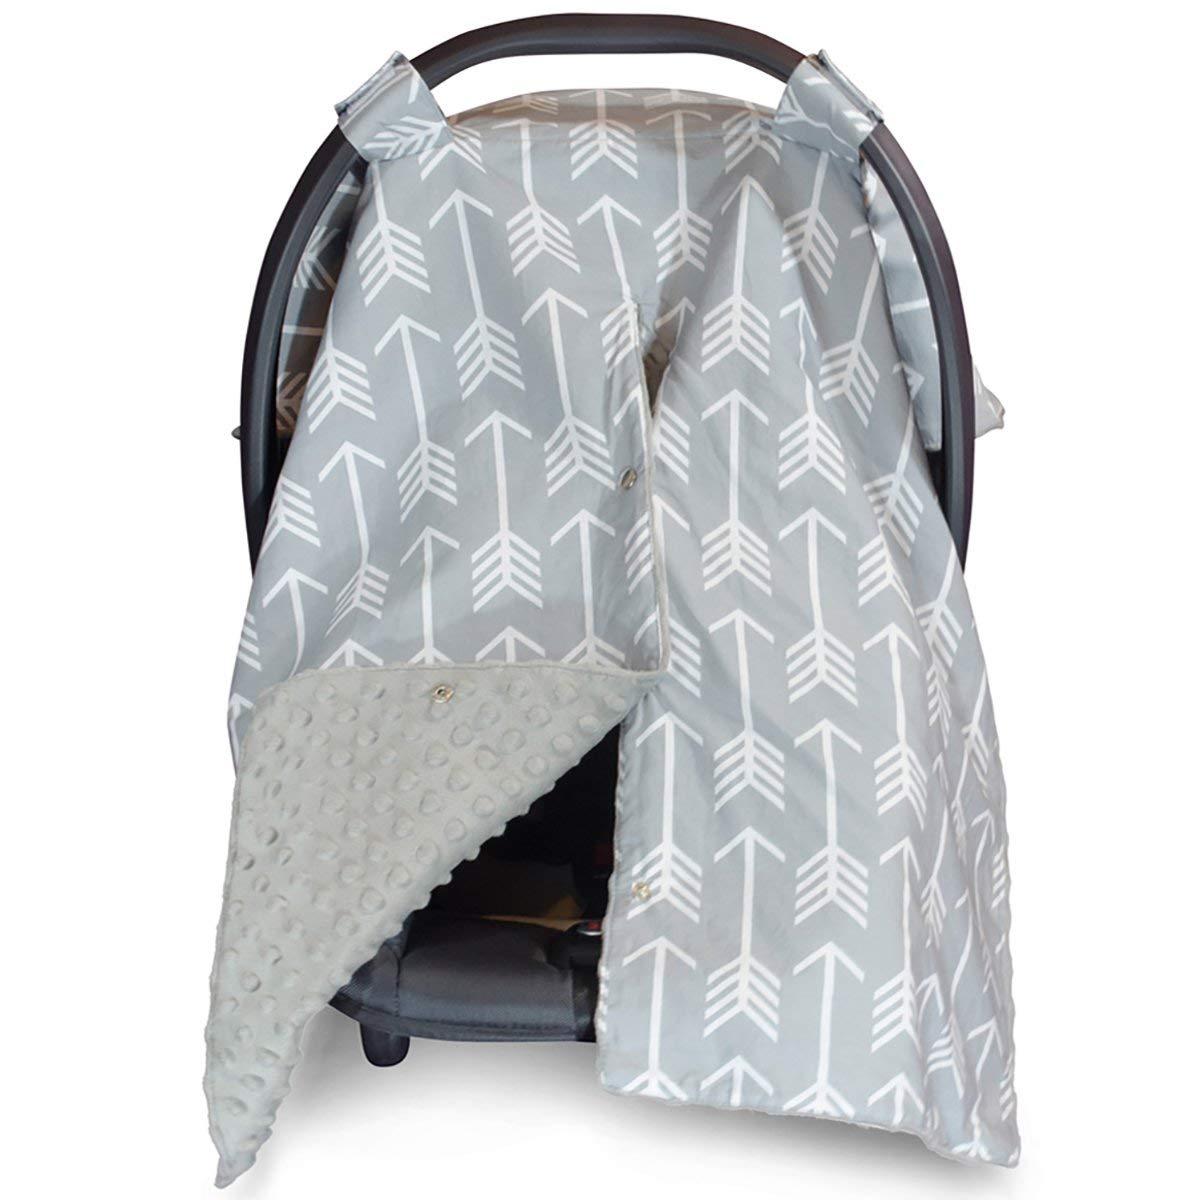 Kids N' Such Peekaboo Baby Car Seat Cover Car Seat Canopy & Nursing Cover, Arrow/Gray Minky